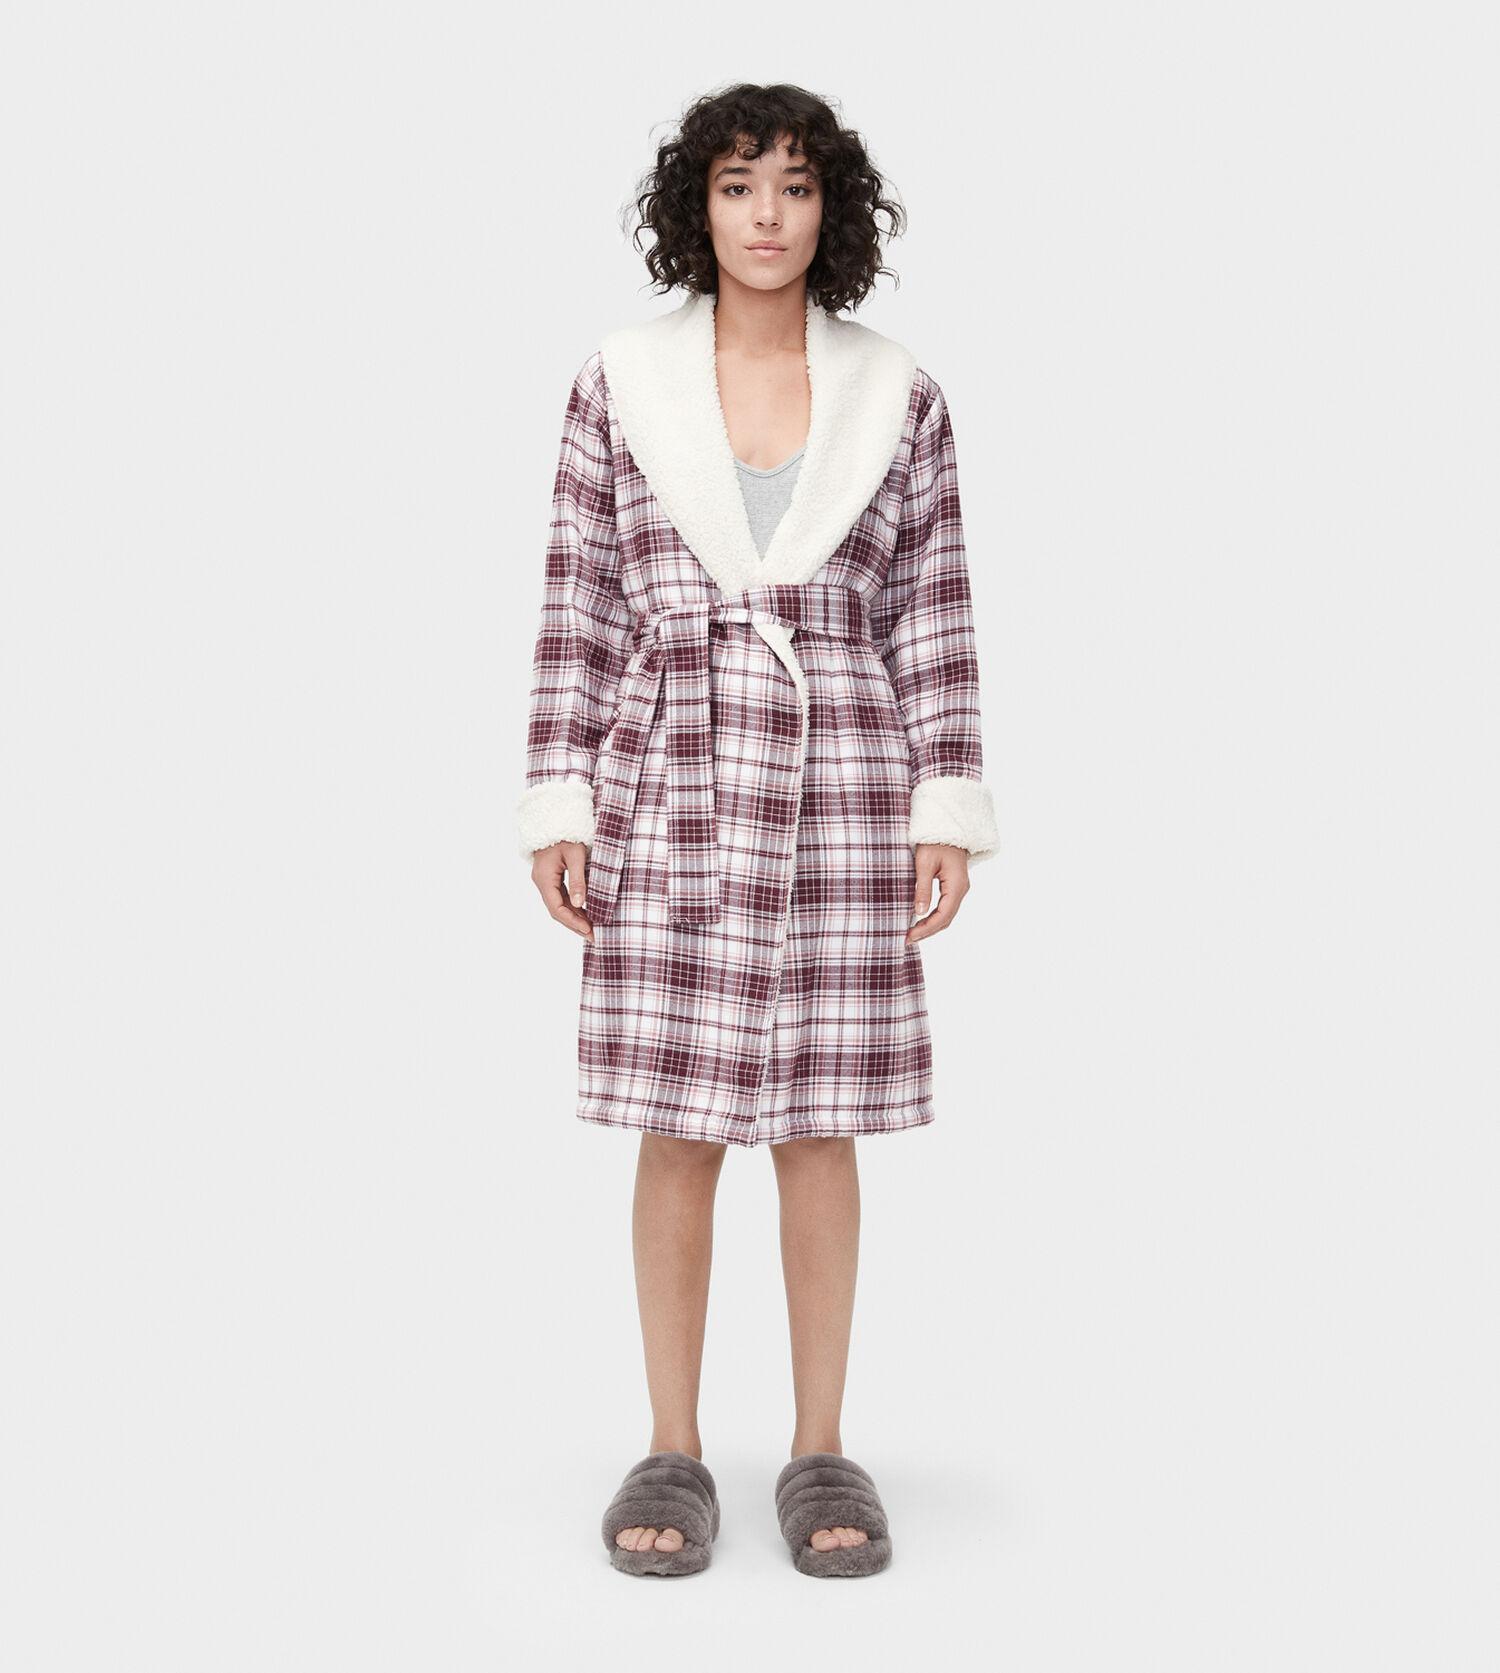 Zoom Anika Flannel Robe - Image 1 of 5 86f63e9781